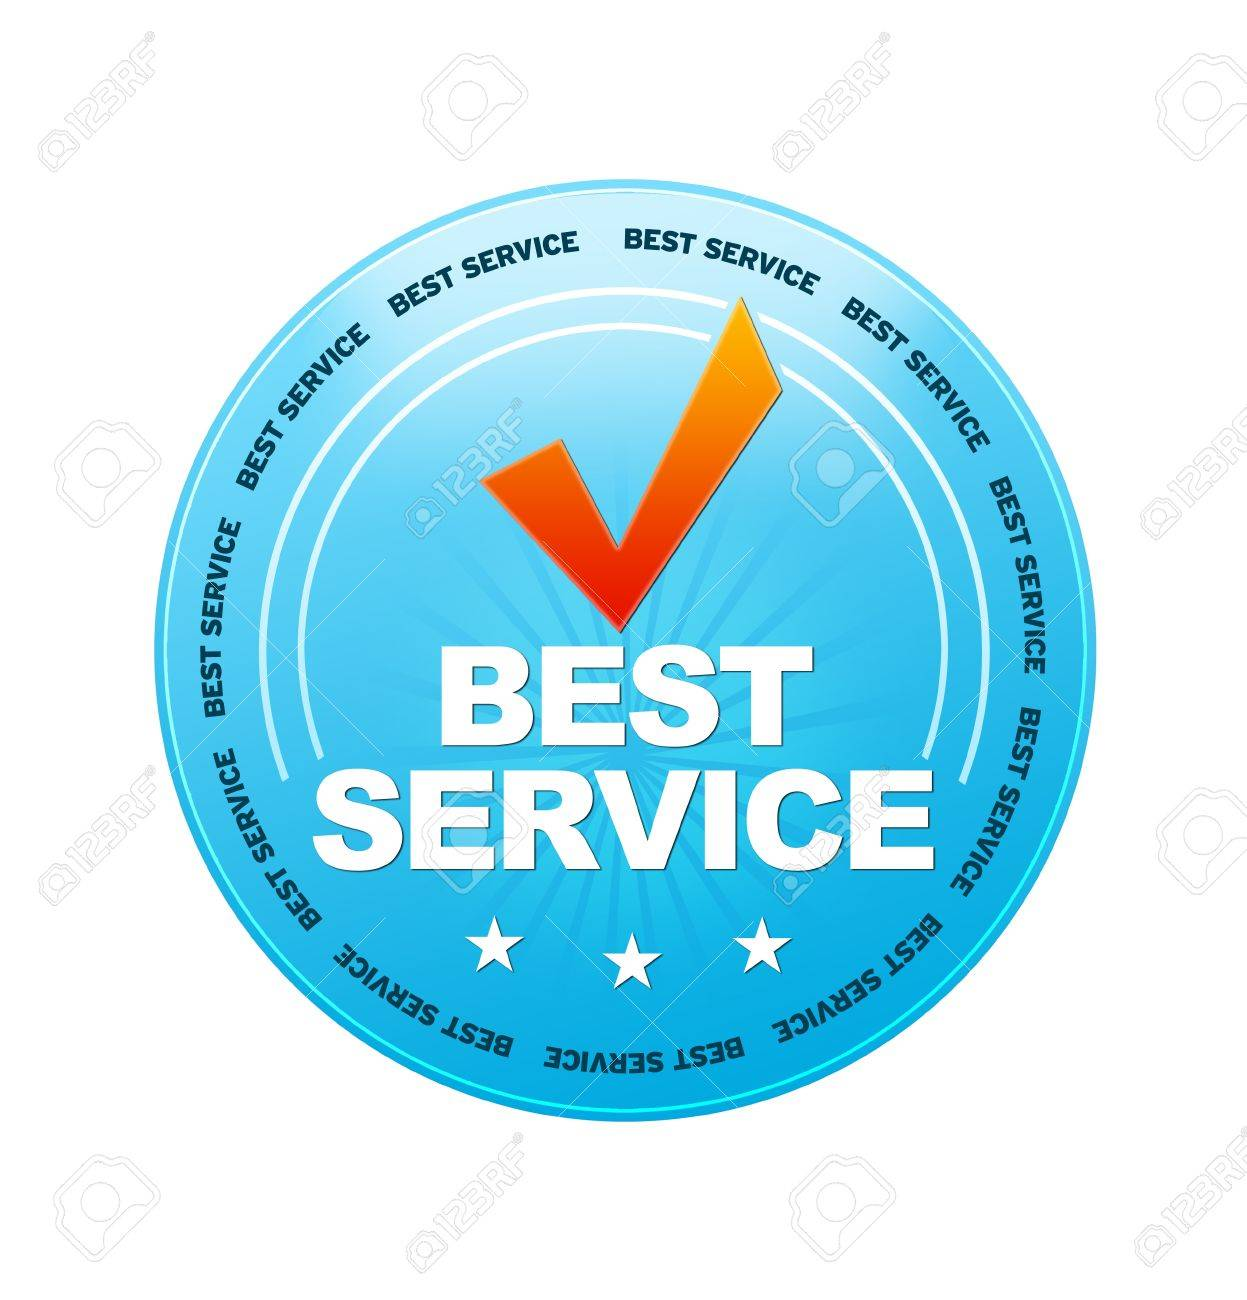 Blue Best Service icon on white background Stock Photo - 12721414